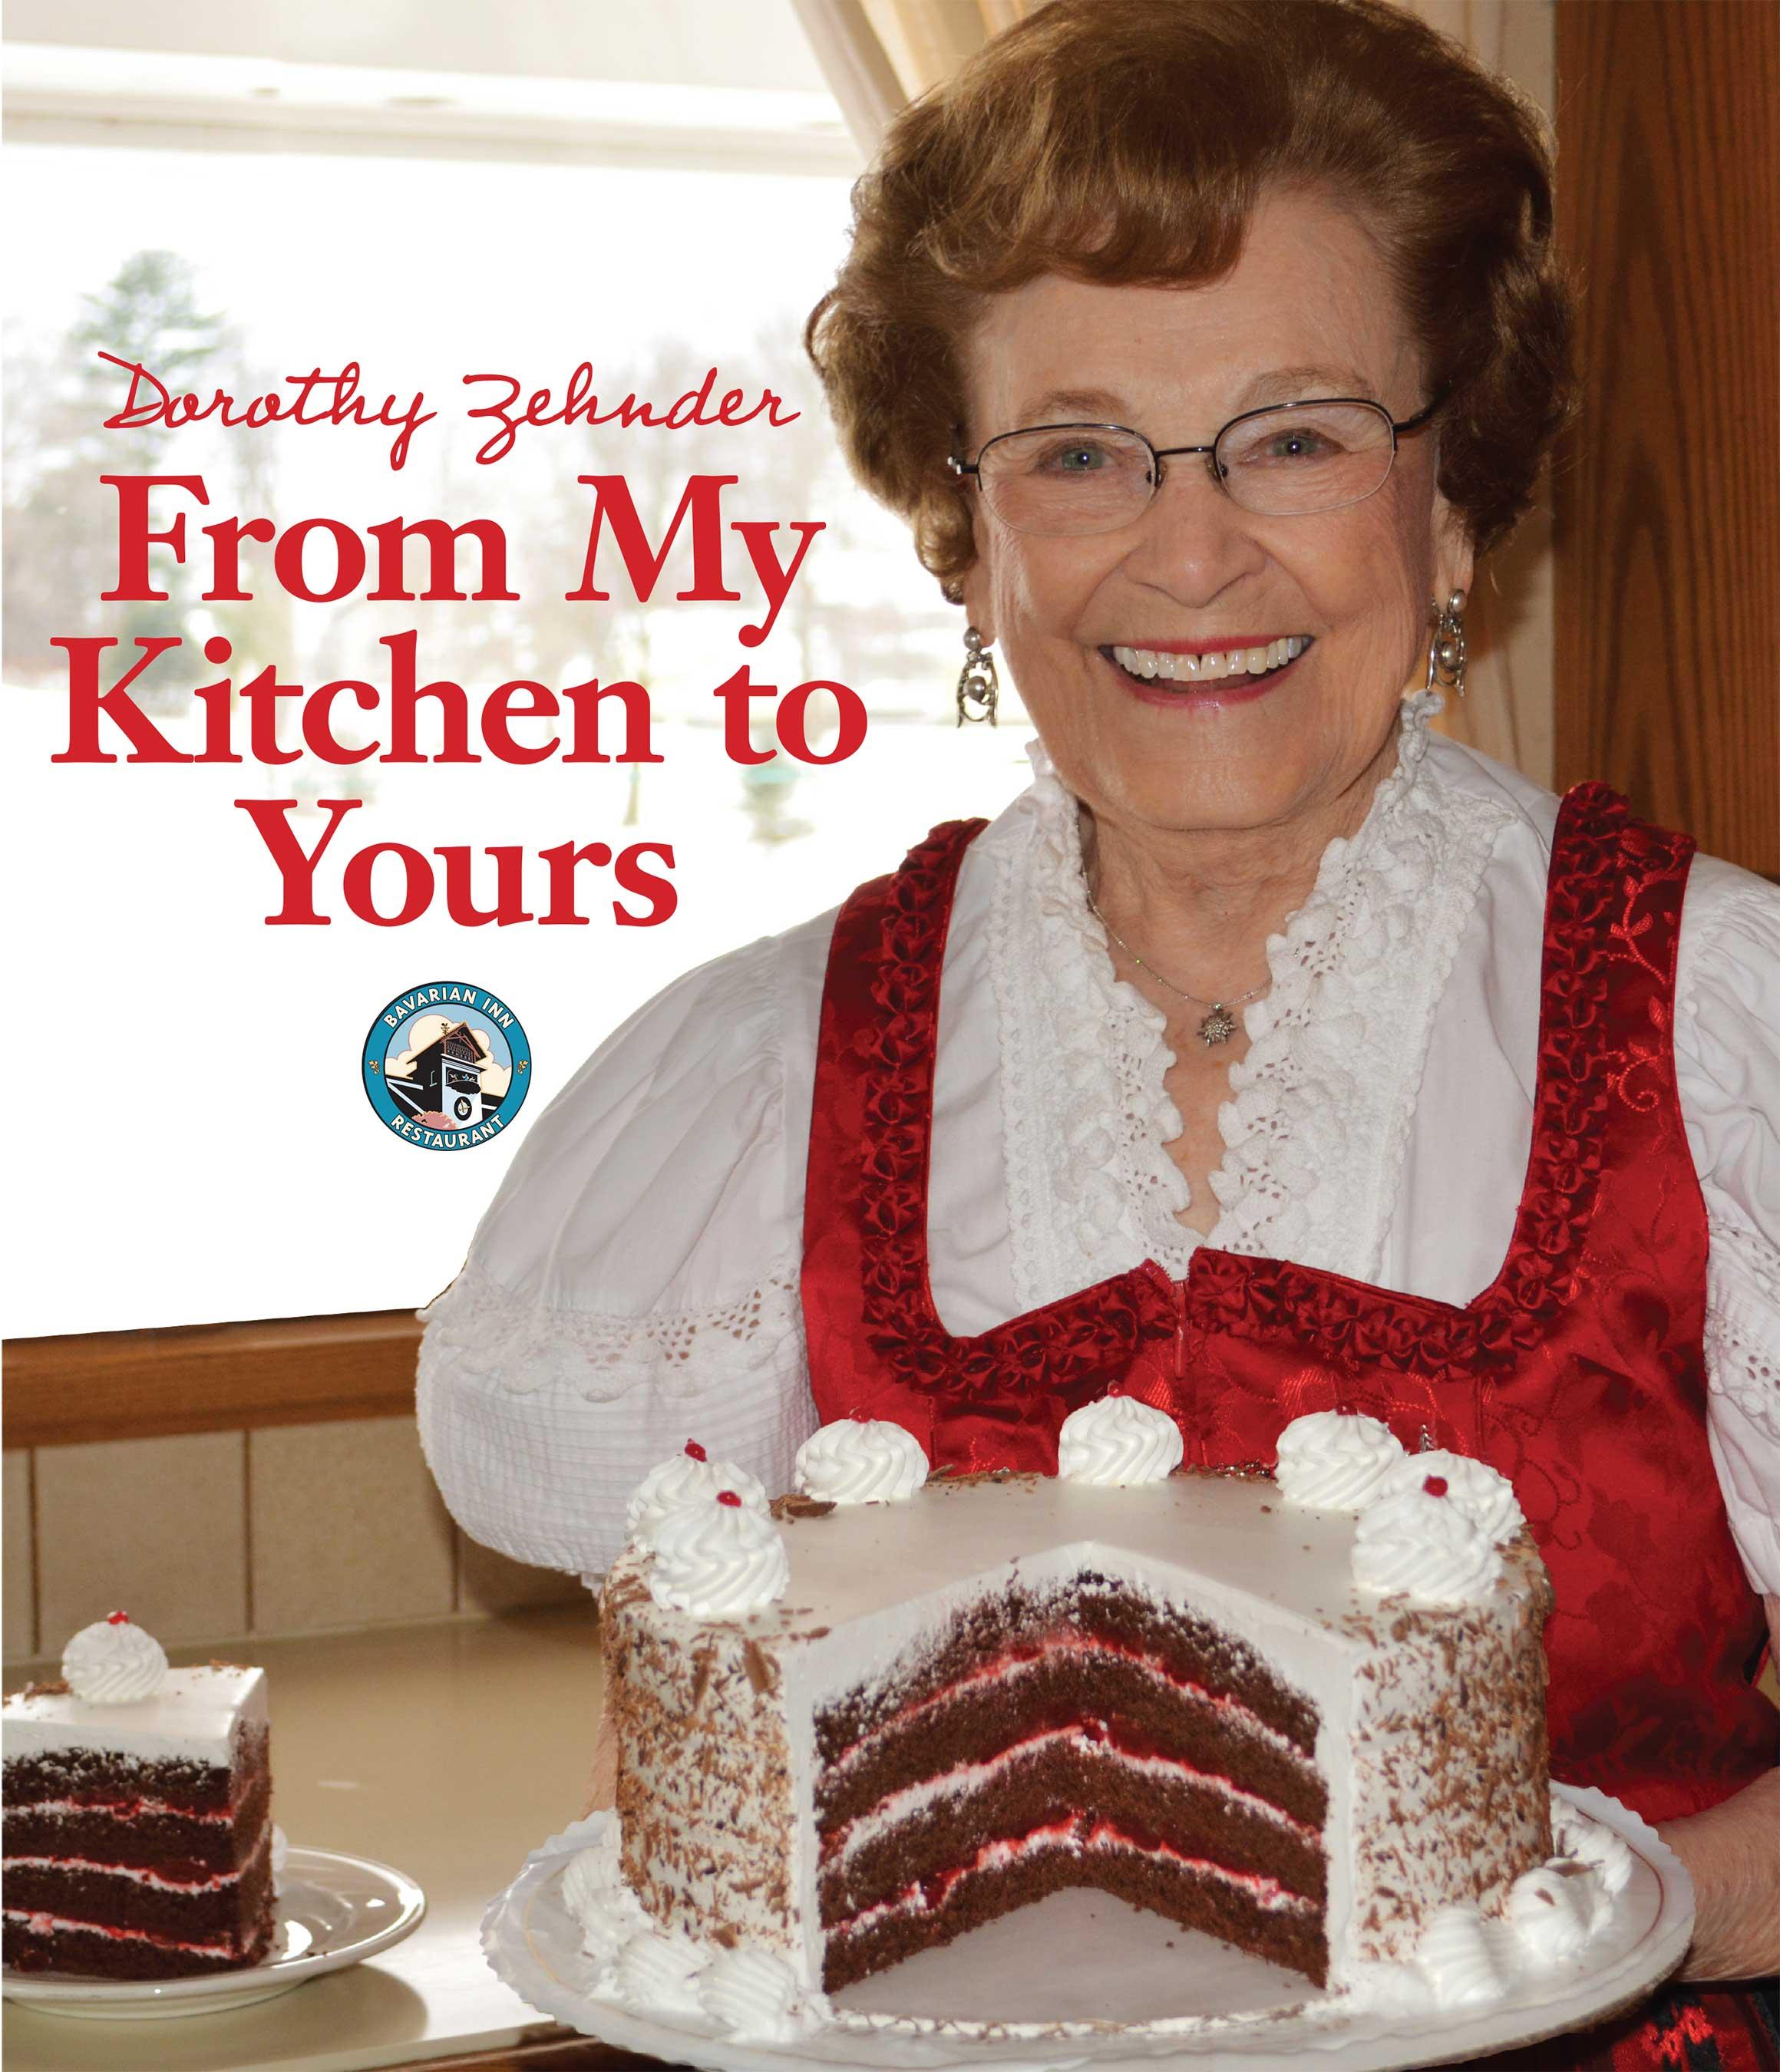 Dorothy Zehnder, Bavarian Inn matriarch, celebrates 95th birthday December 1